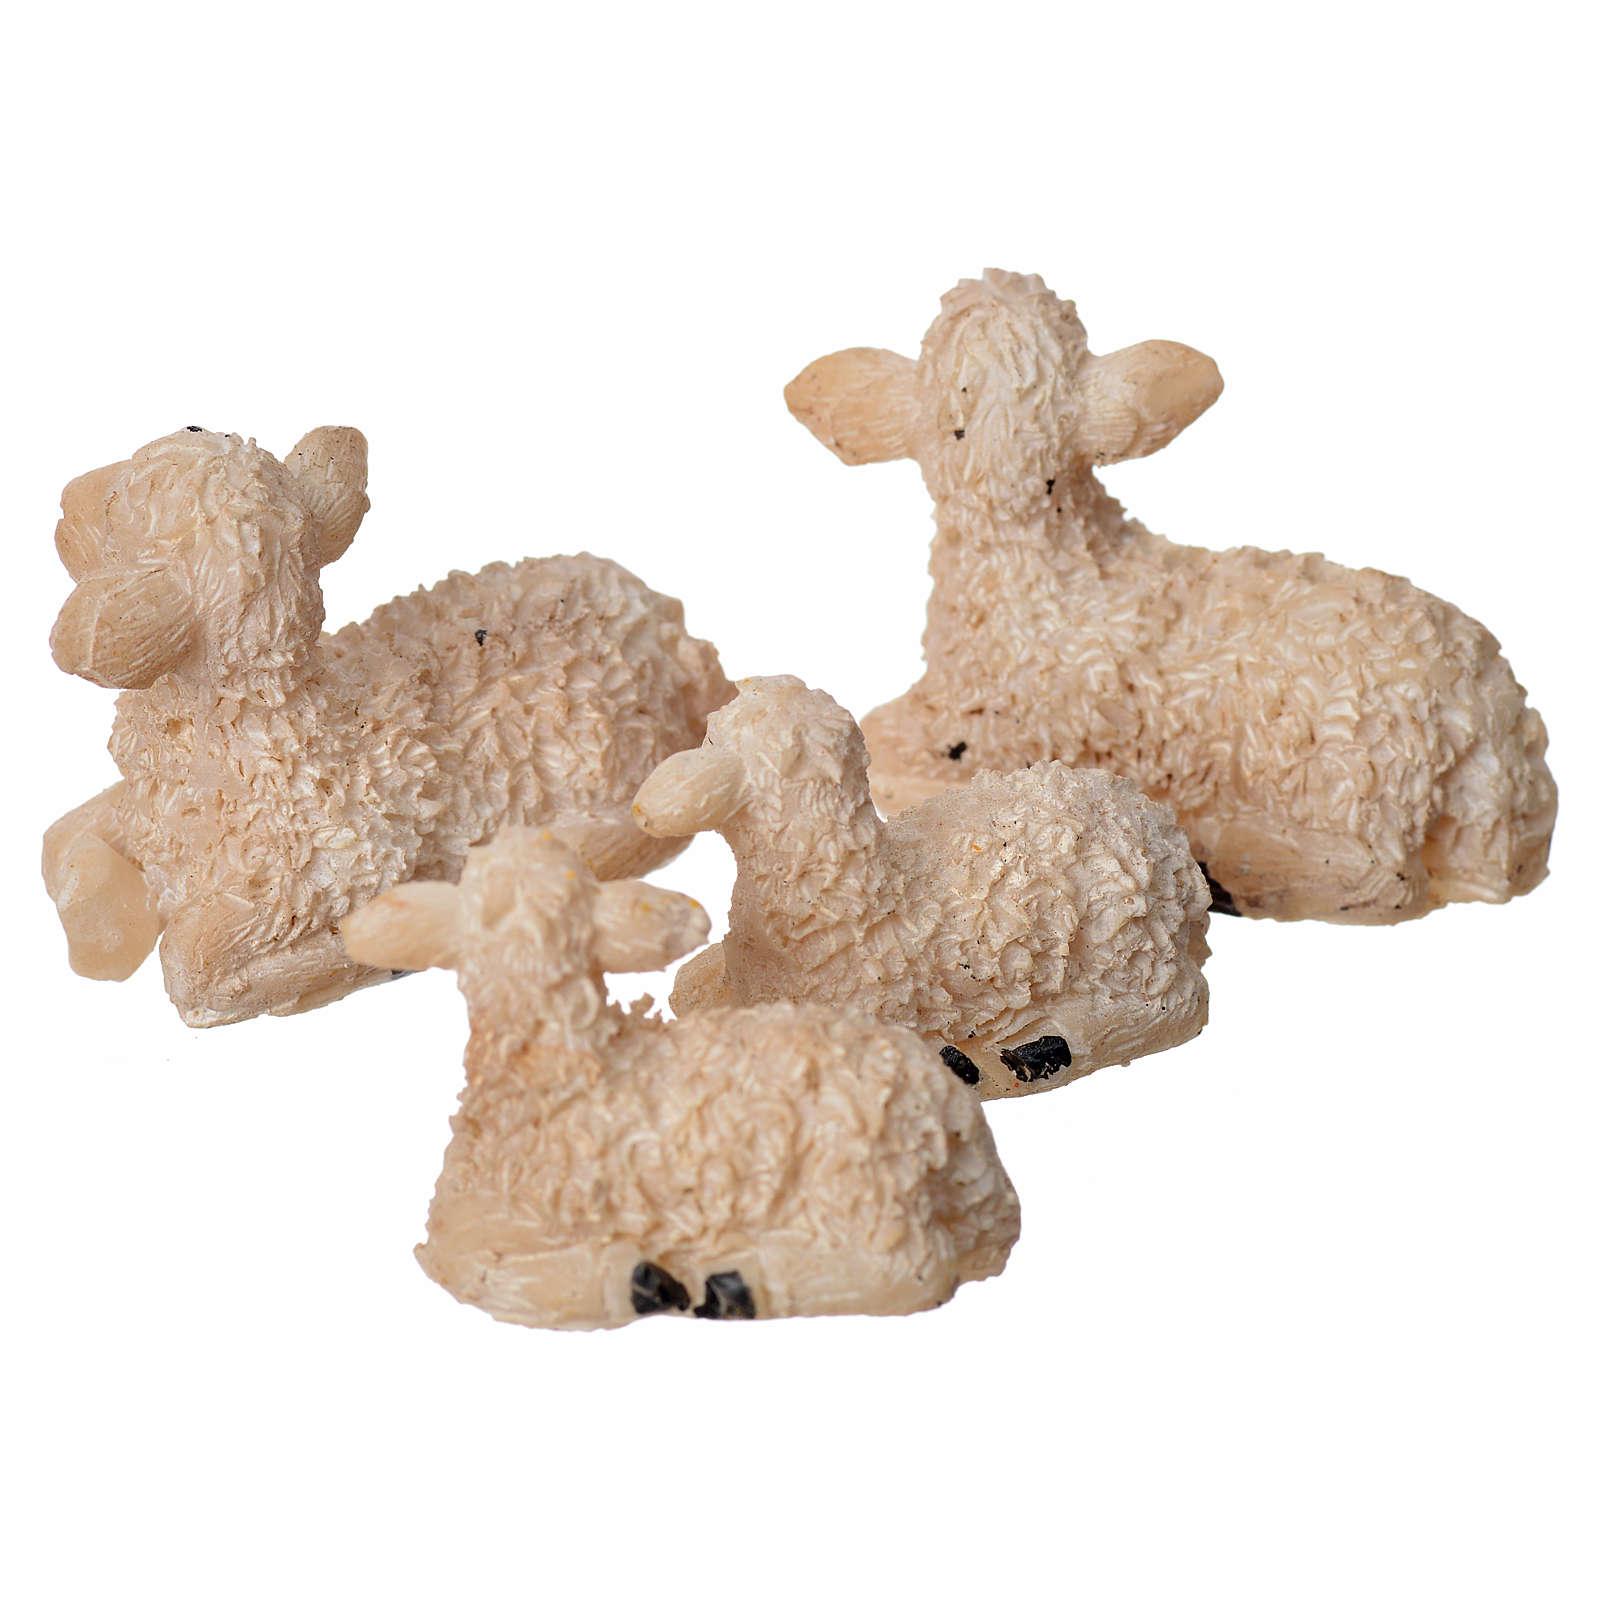 Nativity figurine, resin sheep, 4 pieces 8cm 3